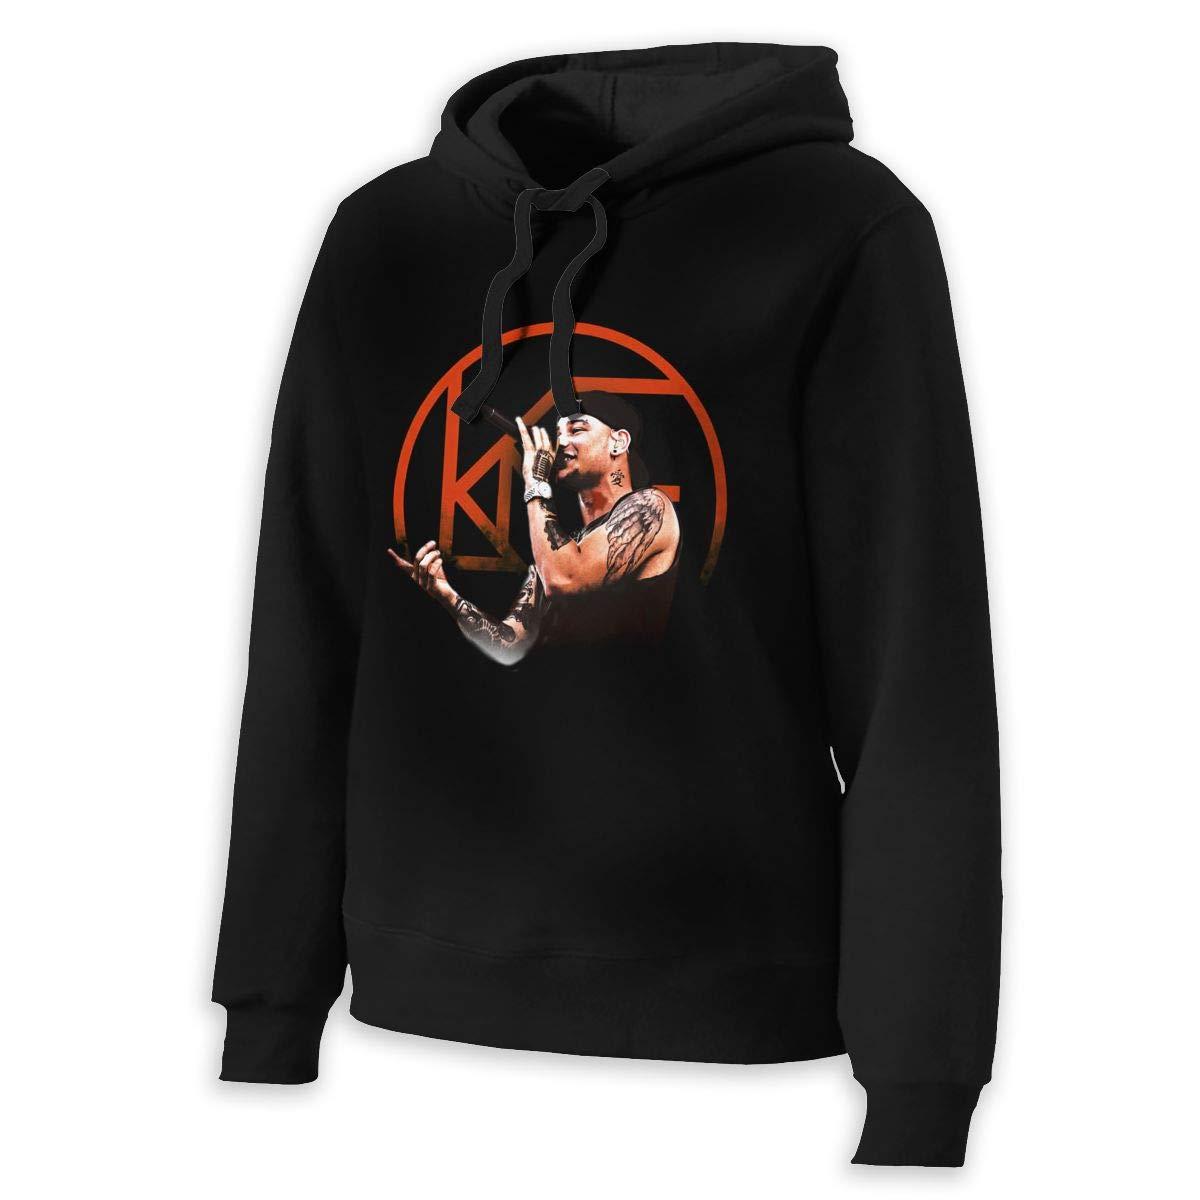 Vicromanko Womans Kane Brown Sweater Classic Drawstring 4587 Shirts